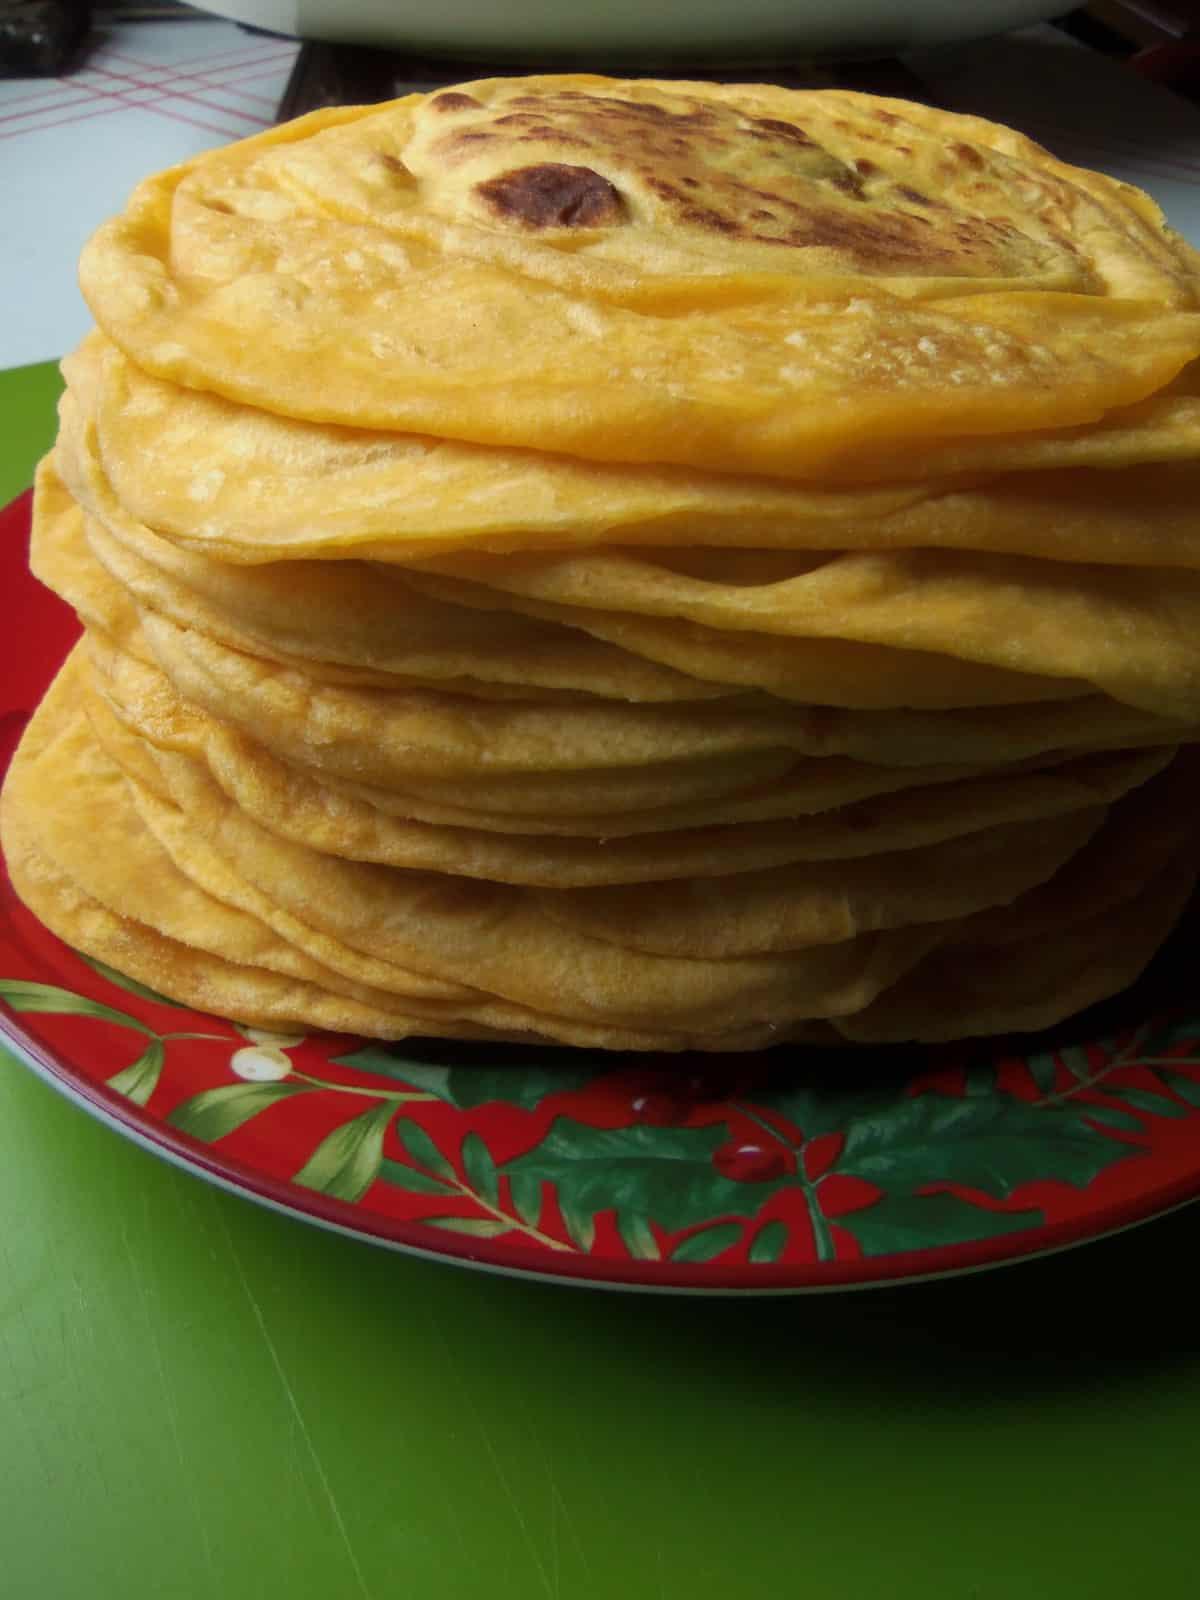 Annatto Infused Flour Tortillas